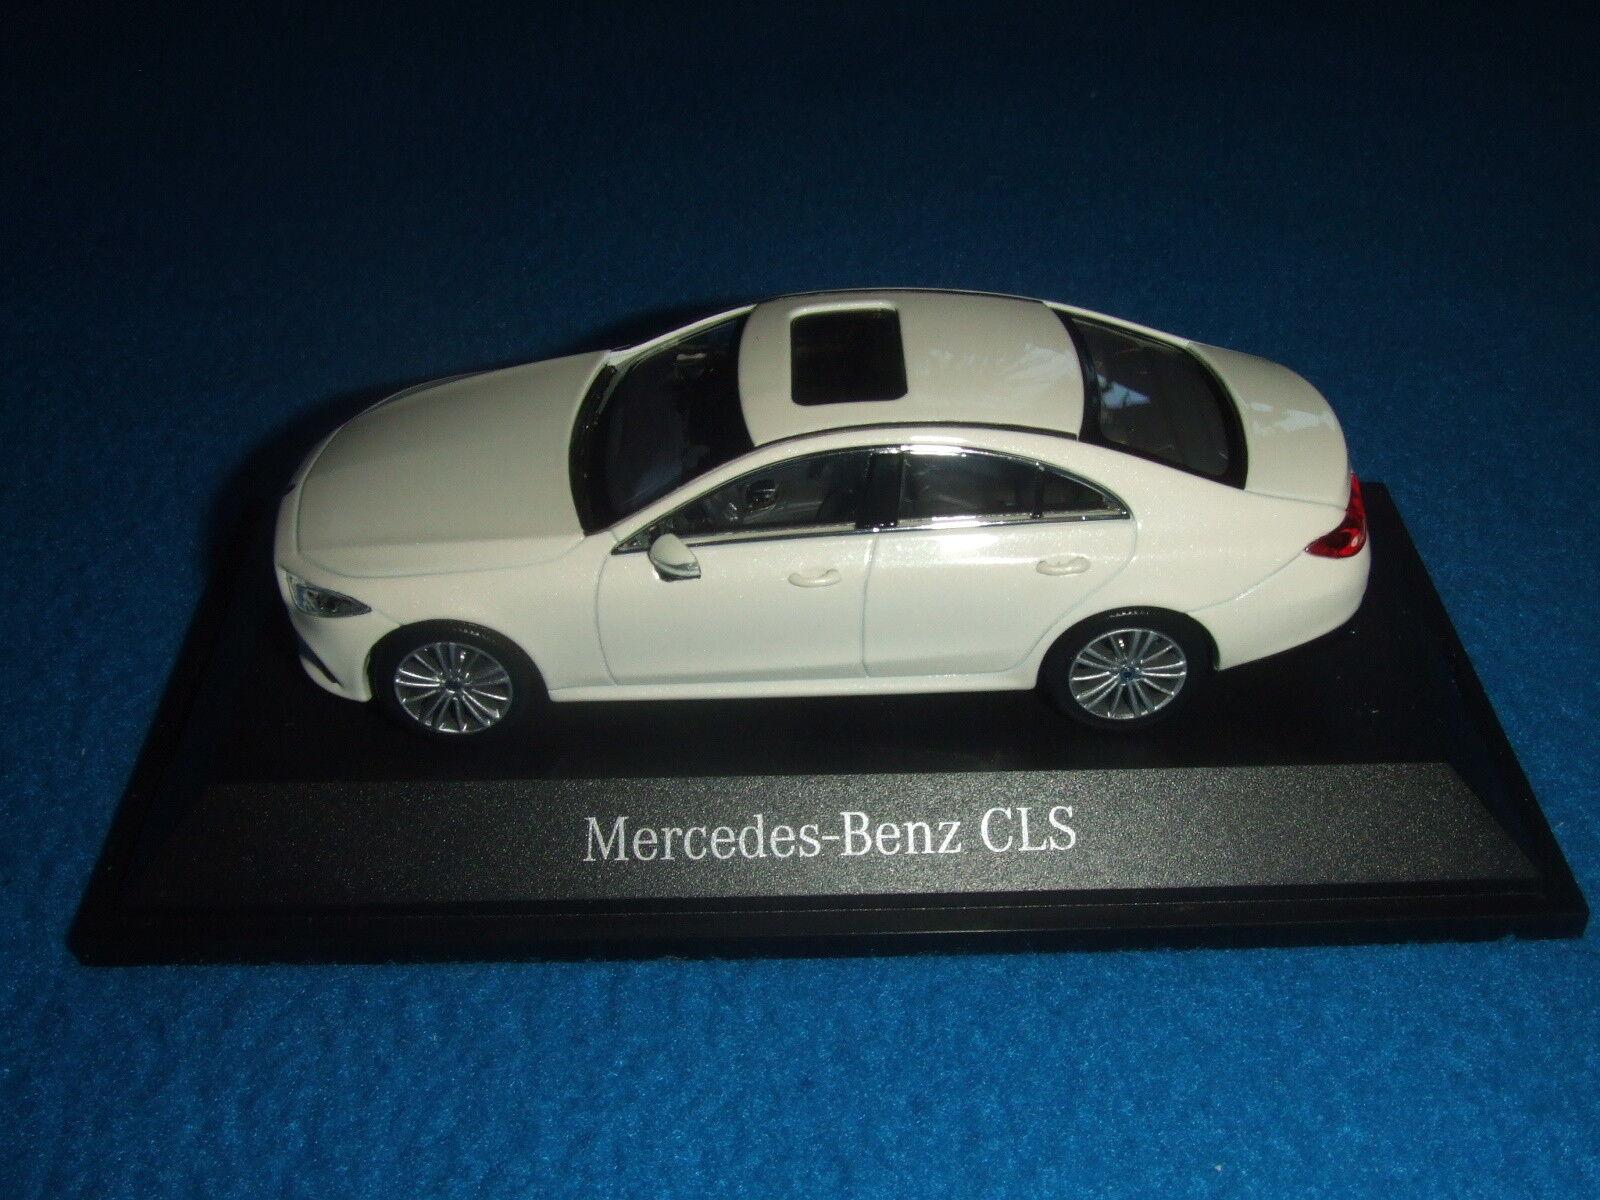 Mercedes bemz c 257 CLS Coupe 2018 diamante blancoo blancoo blancoo 1 43 nuevo embalaje original 7b04c9